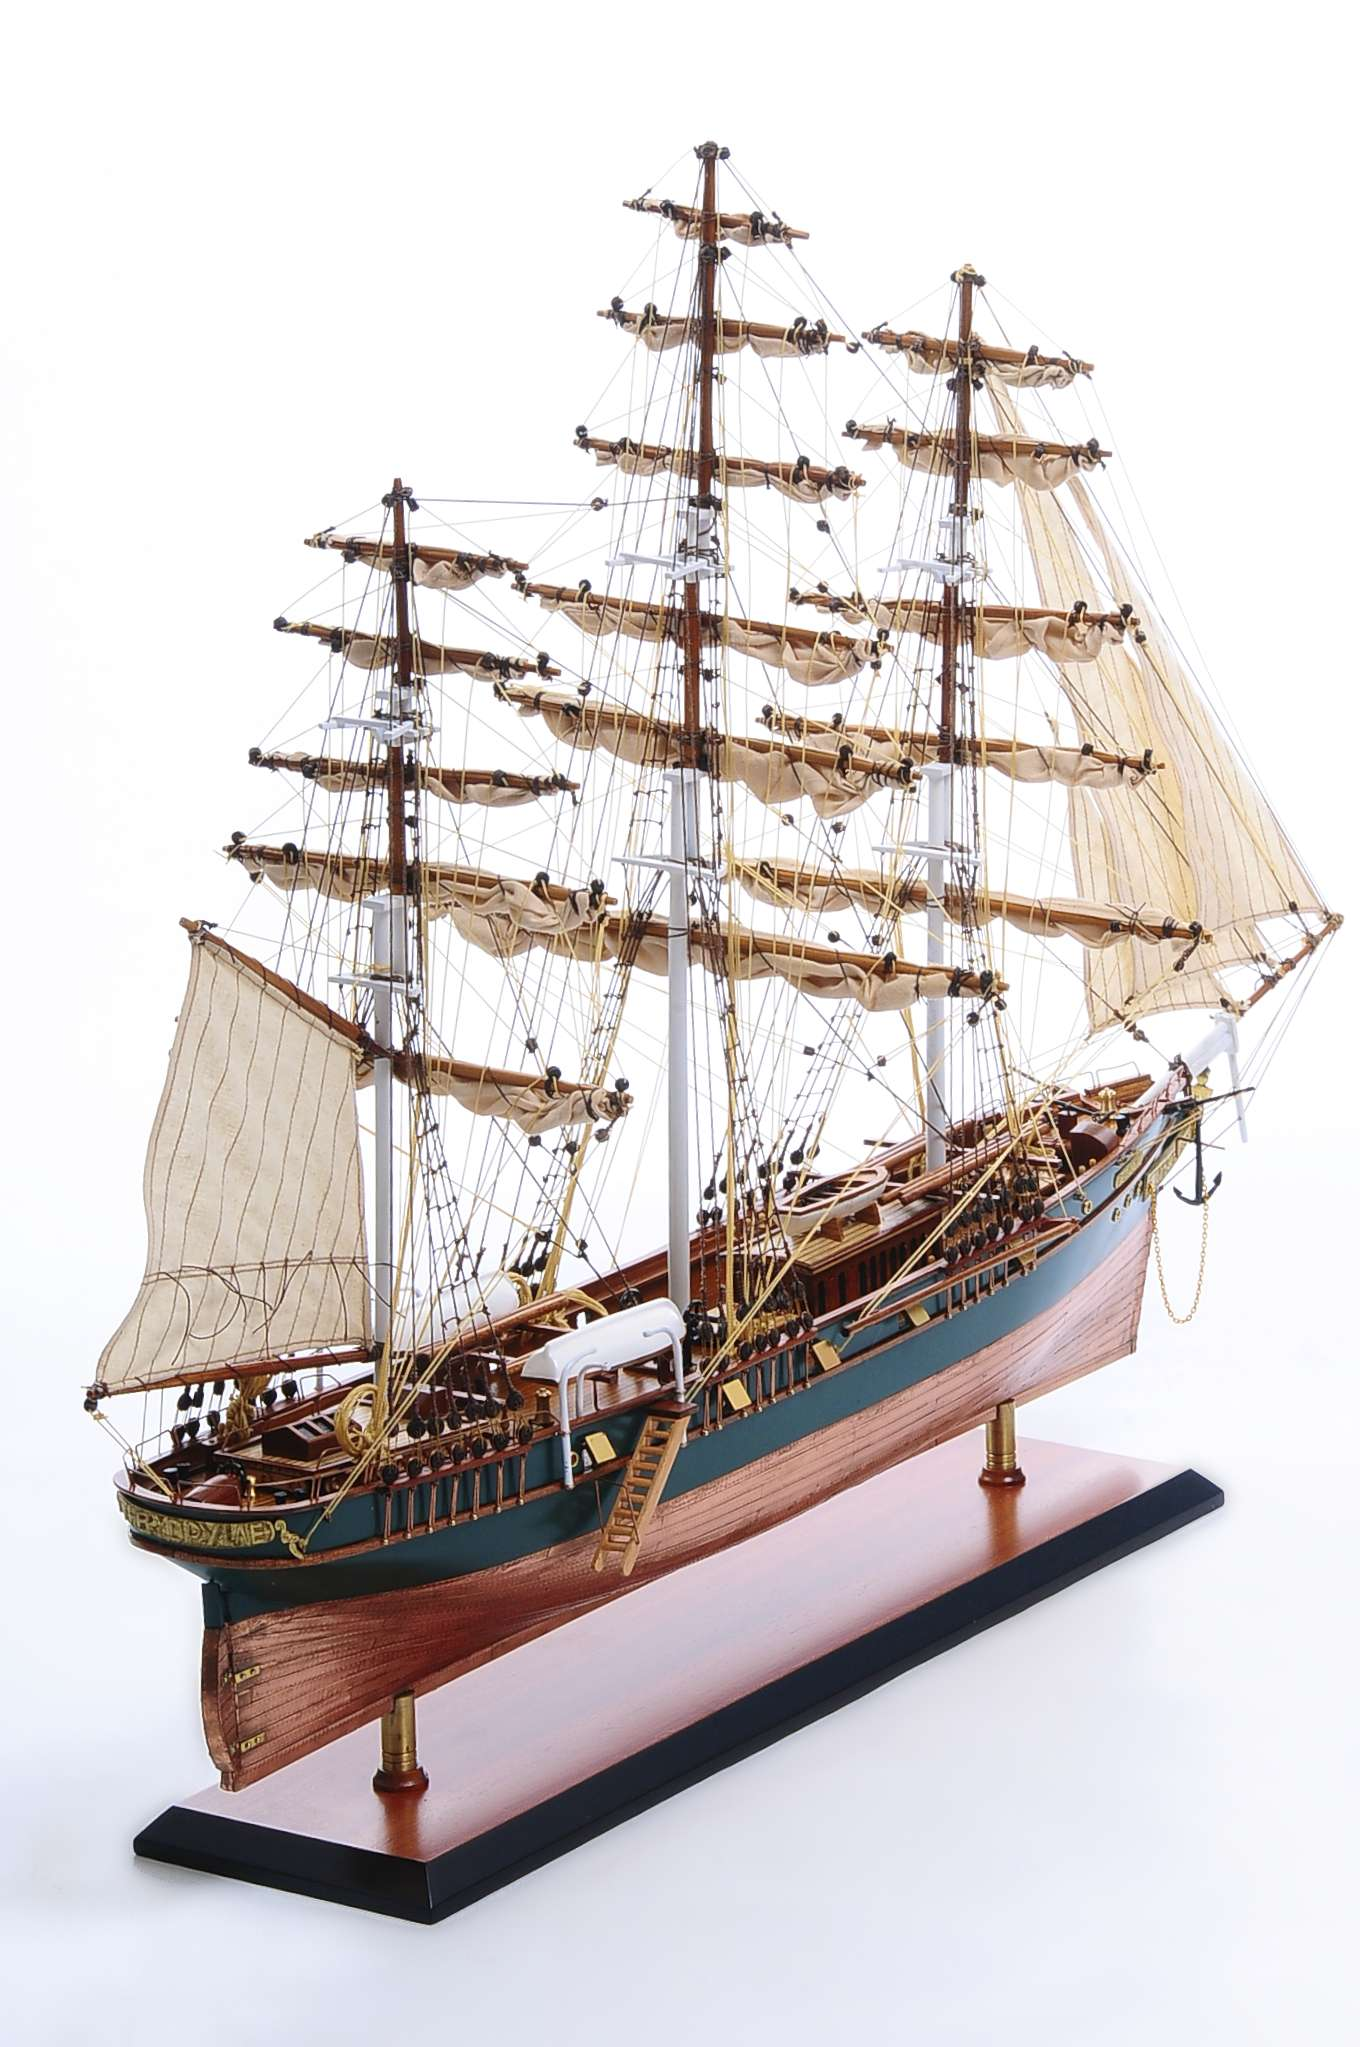 1434-4861-Thermopylae-Model-Boat